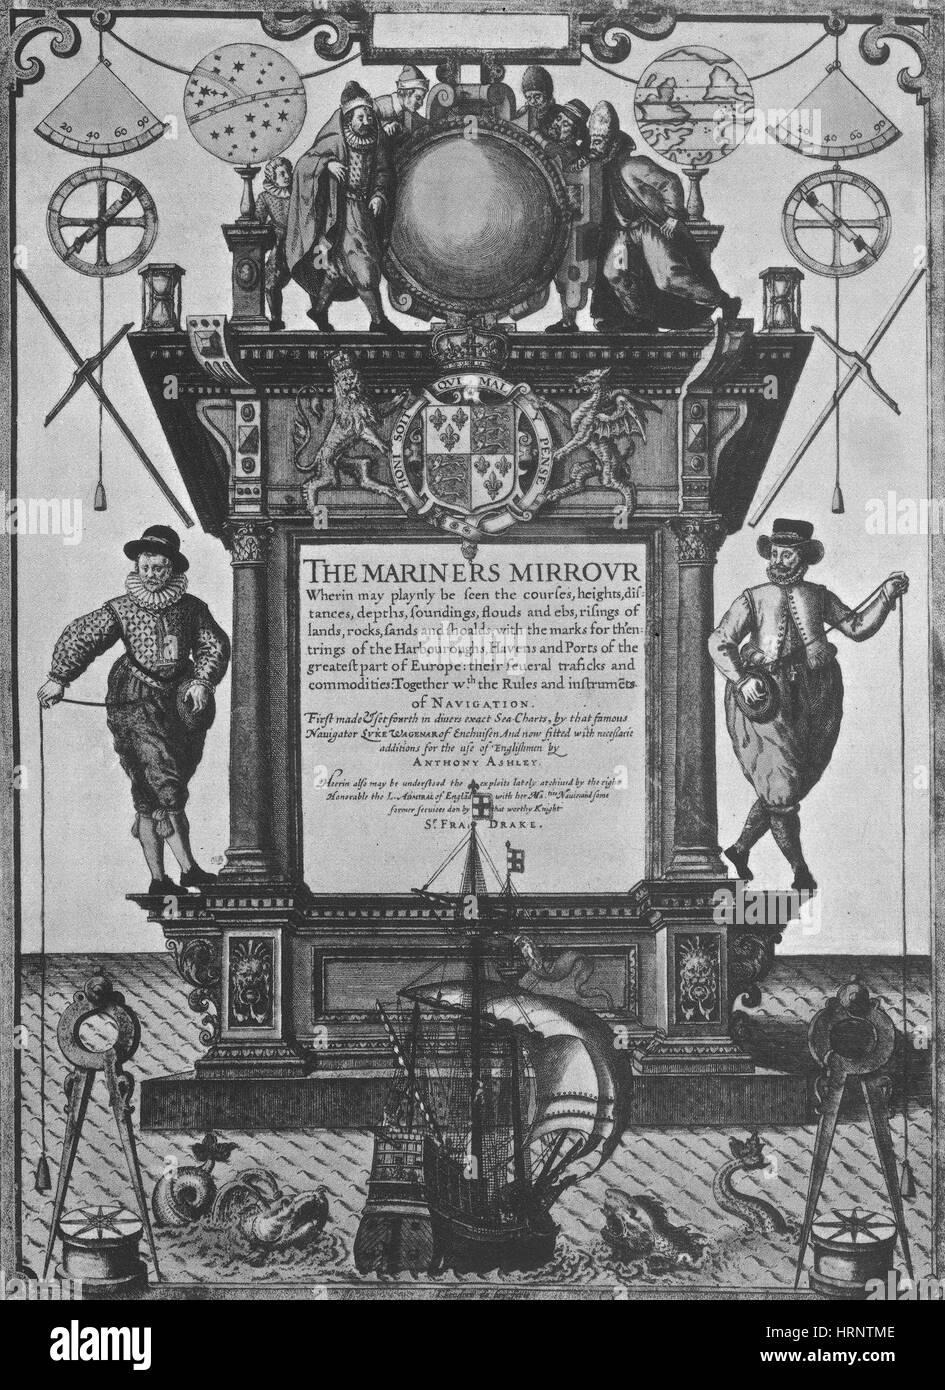 The Mariners Mirror, 16th Century - Stock Image